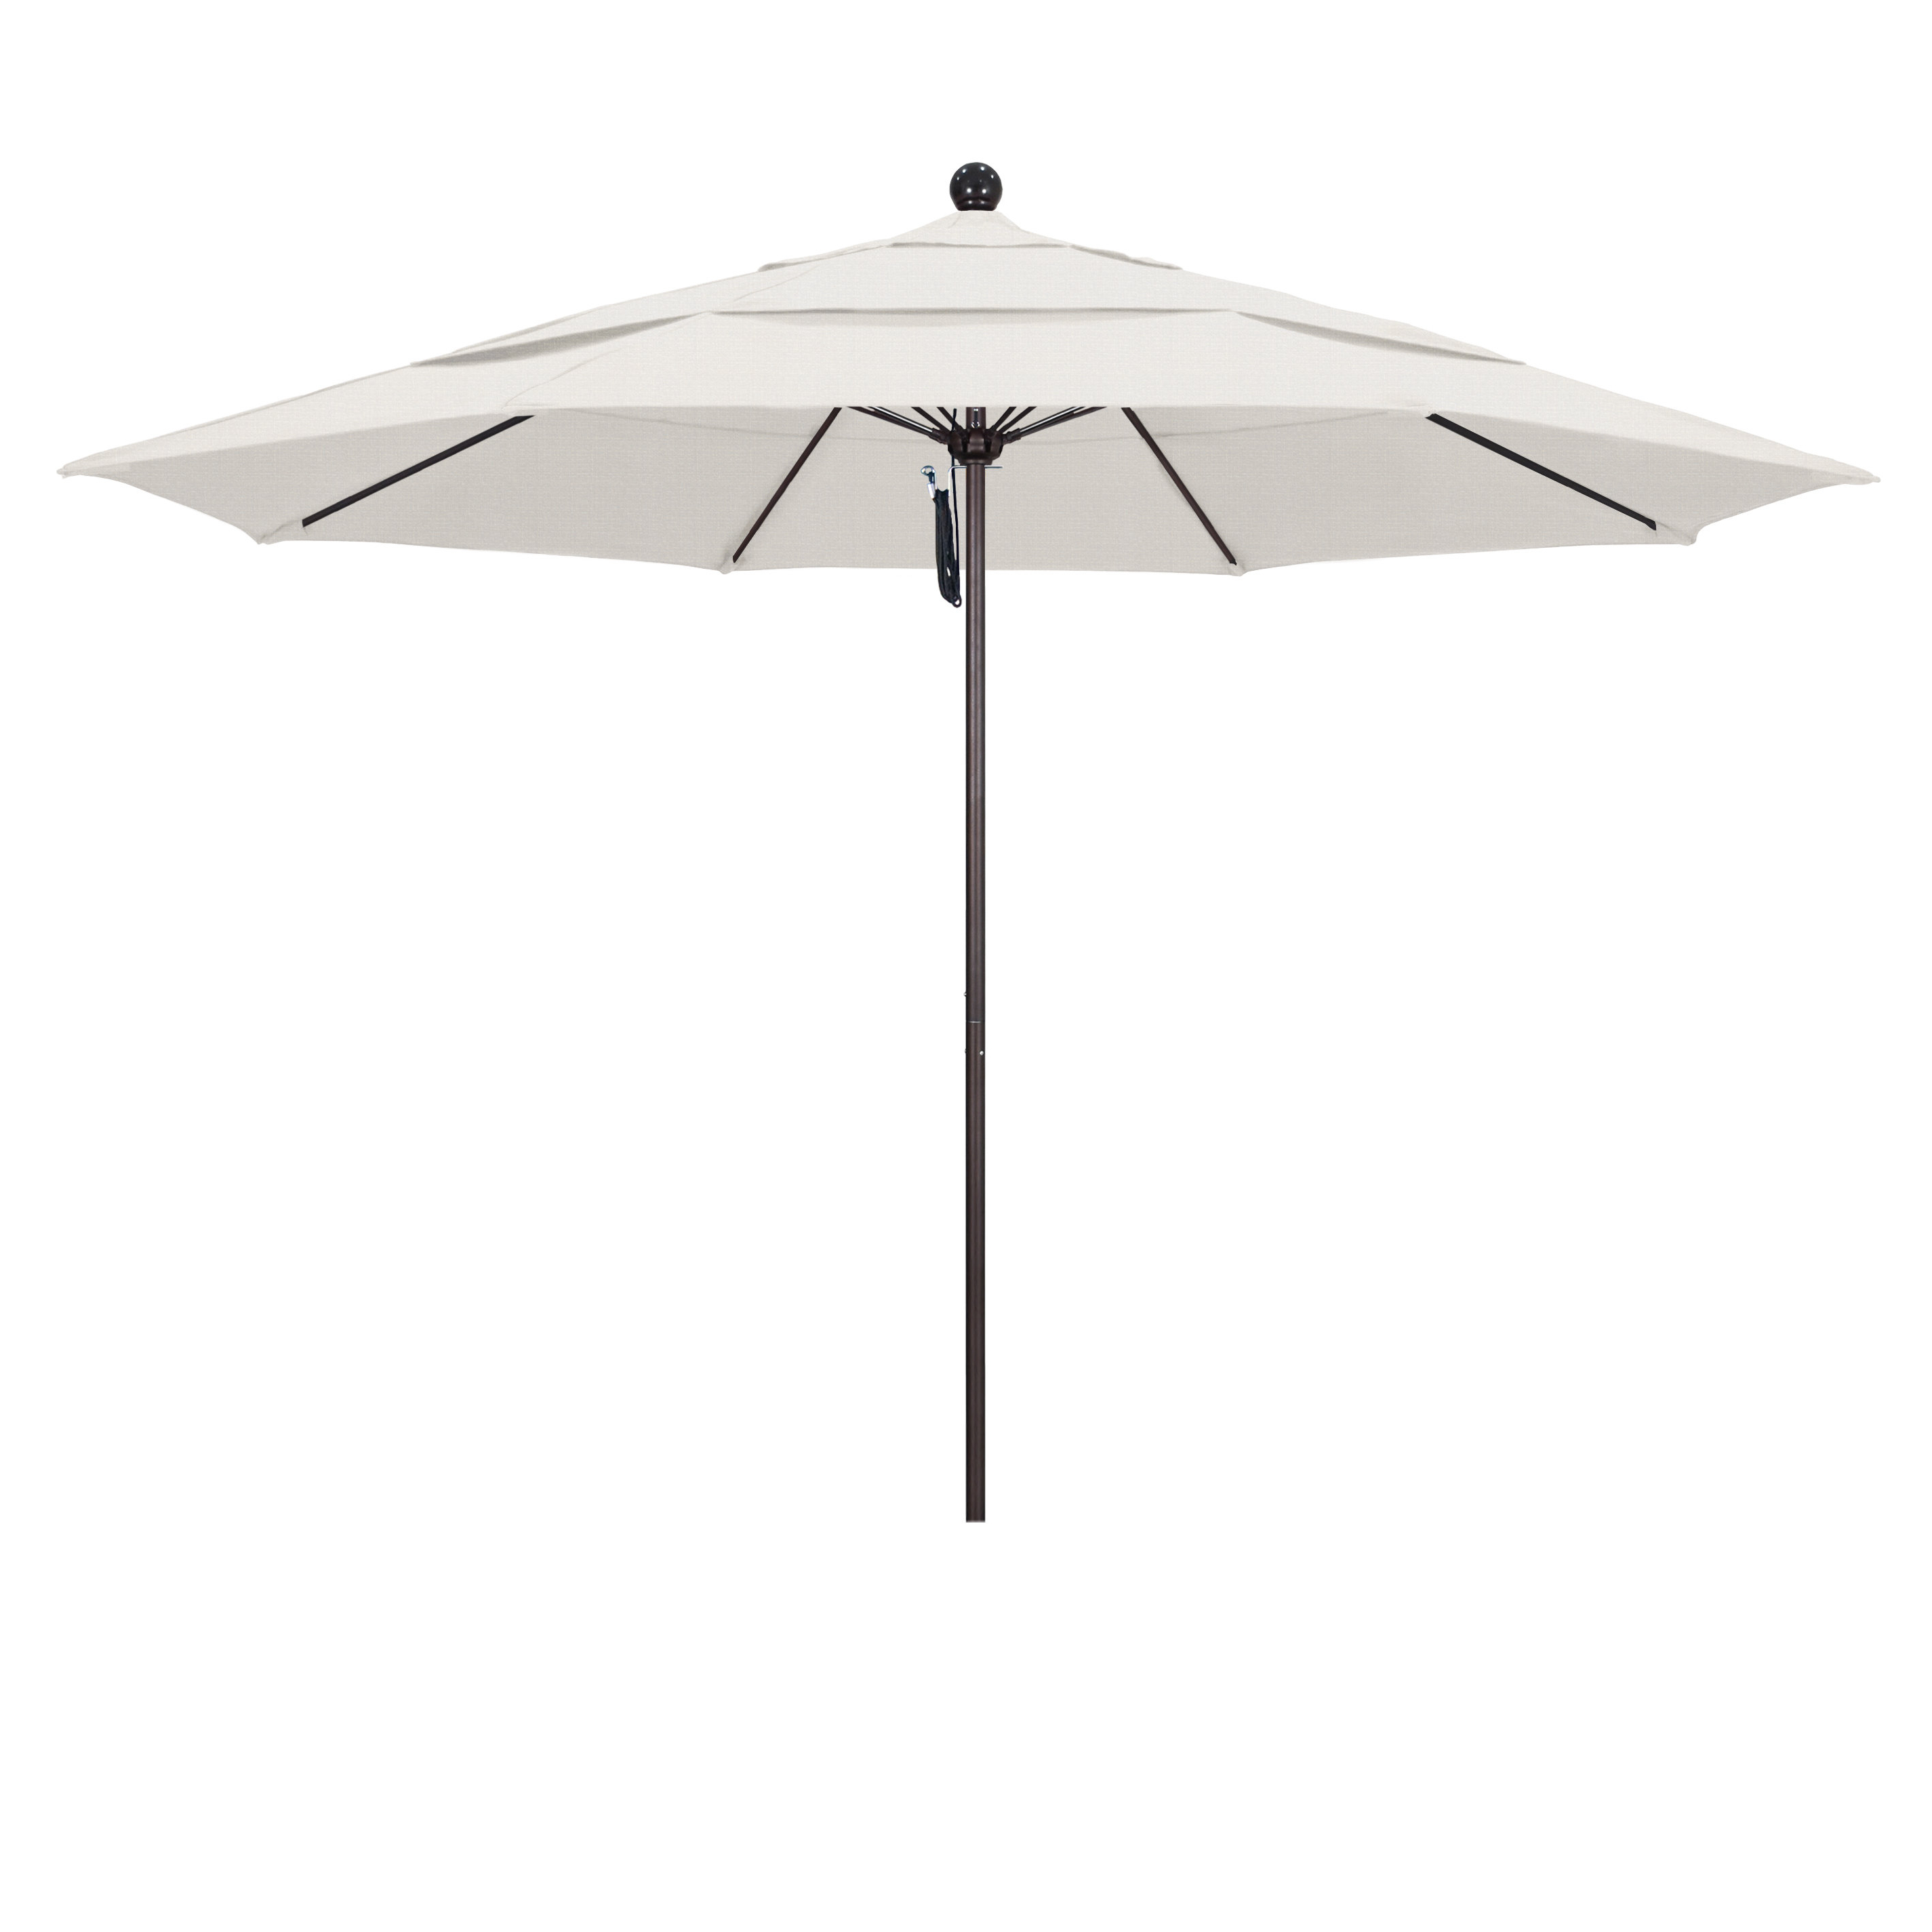 Launceston Market Umbrellas In Most Up To Date Davenport 11' Market Umbrella (View 8 of 20)